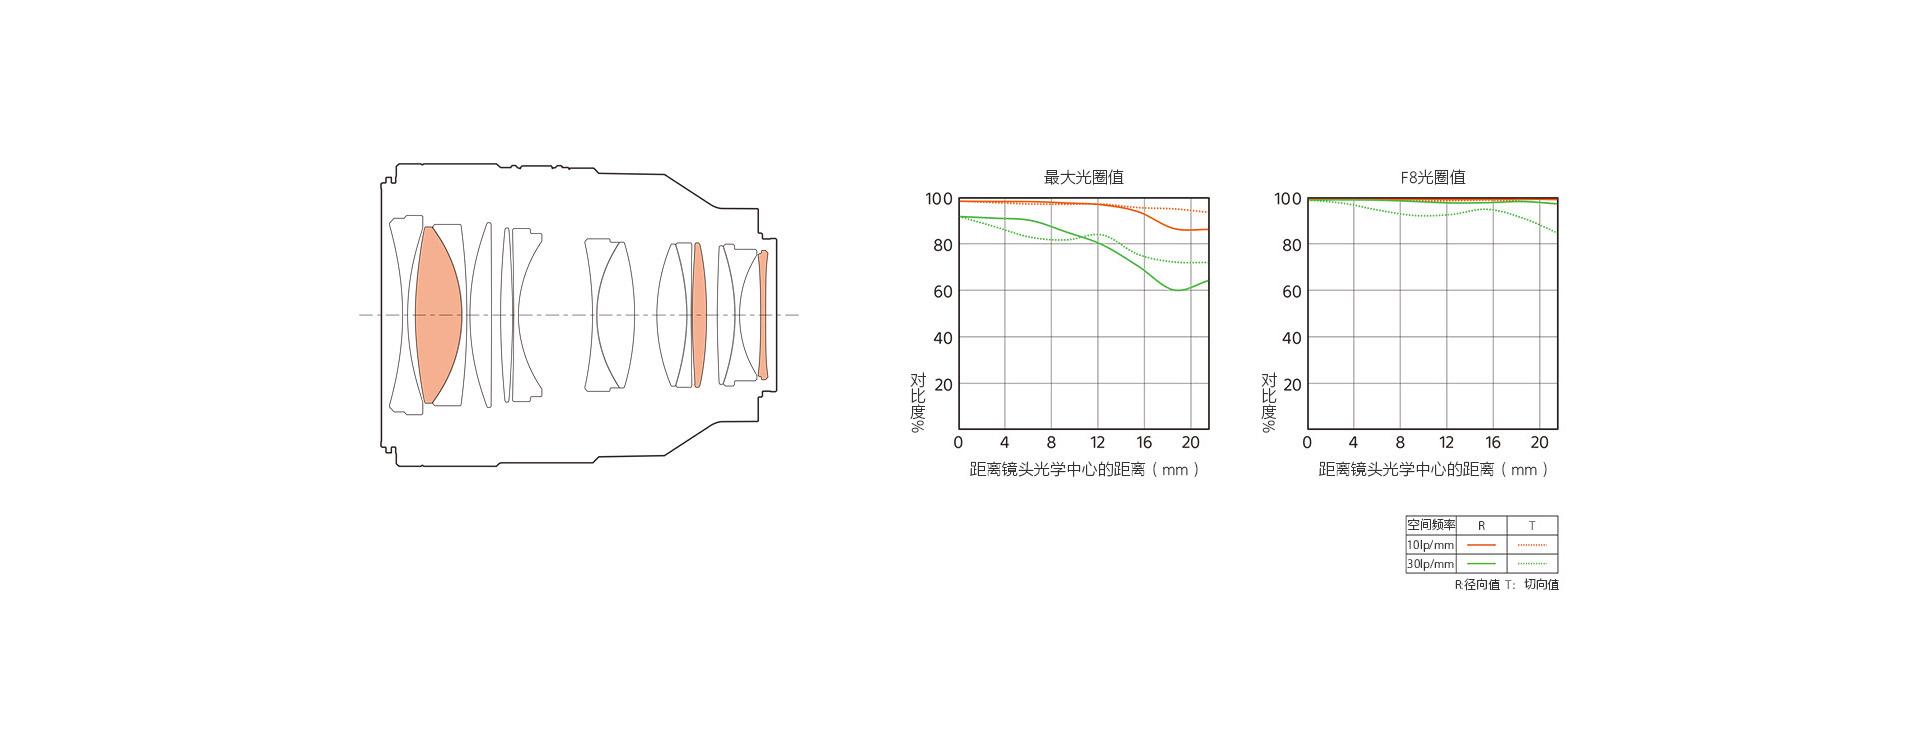 XA(超级非球面)镜片示意图&成像质量曲线示意图